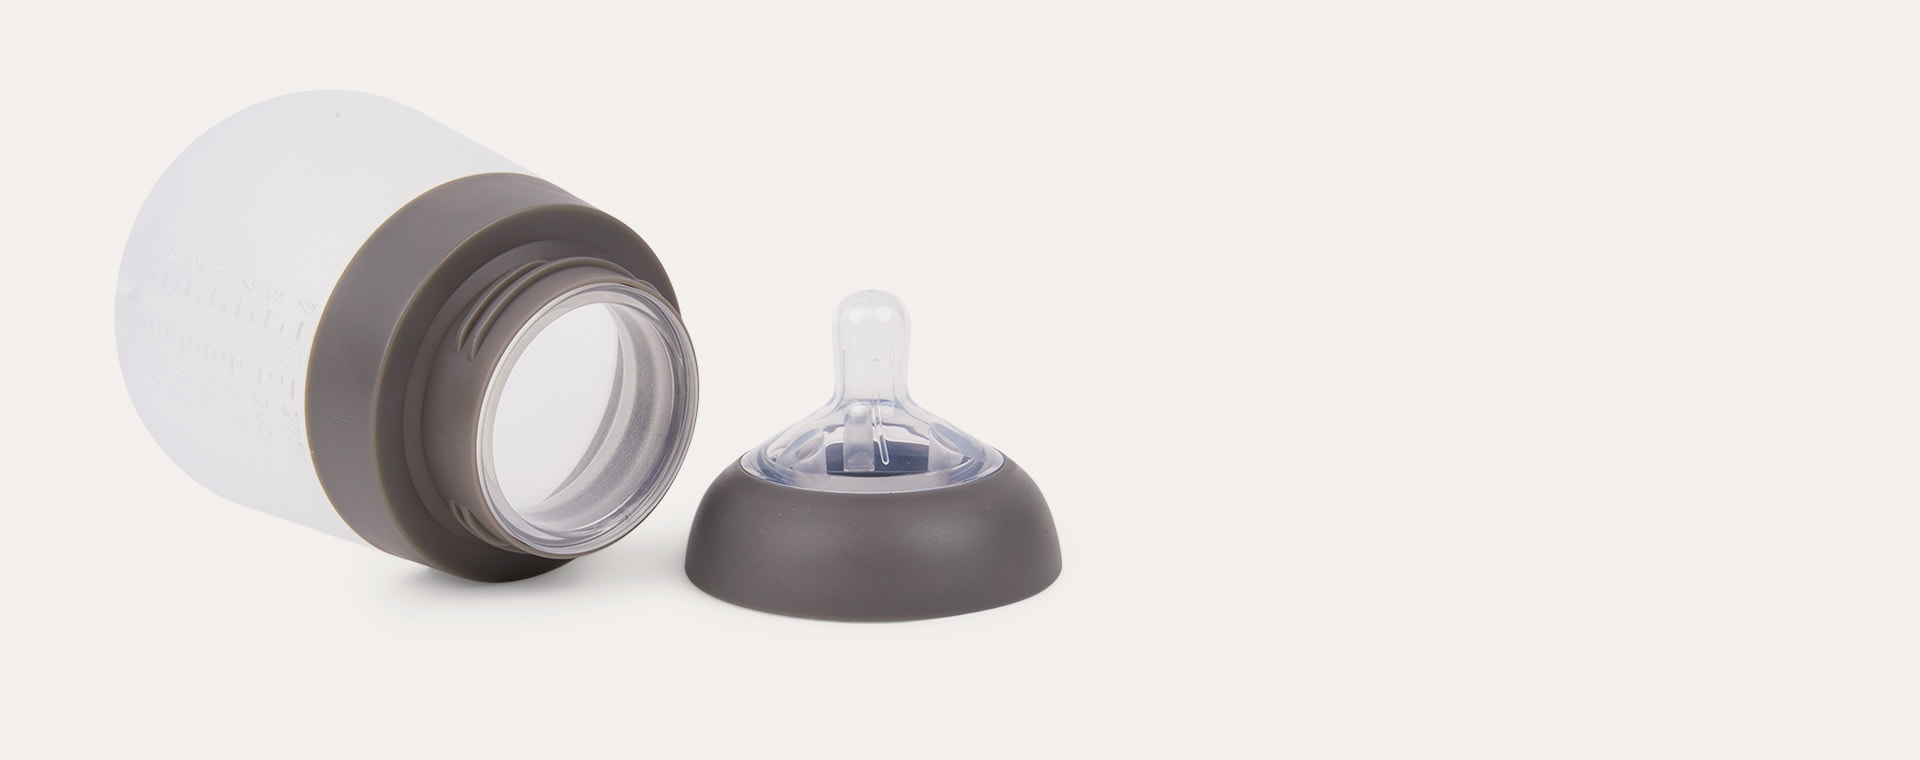 Grey nanobébé 3-Pack Flexy Silicone Baby Bottles